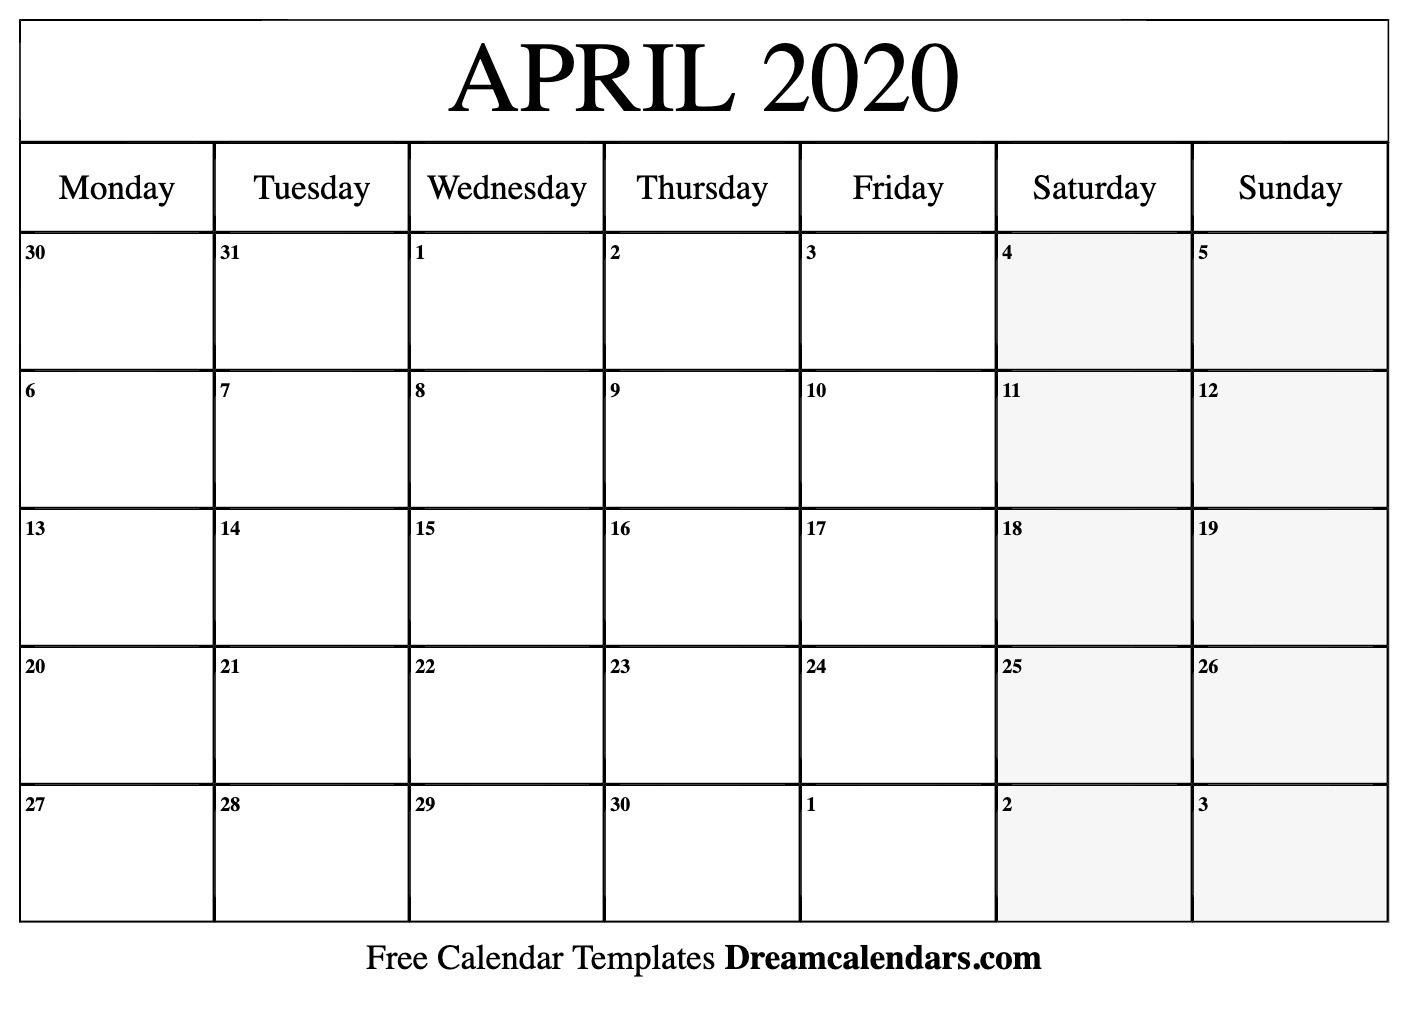 Printable April 2020 Calendar with regard to Printable Calendar 2020 Monday To Sunday